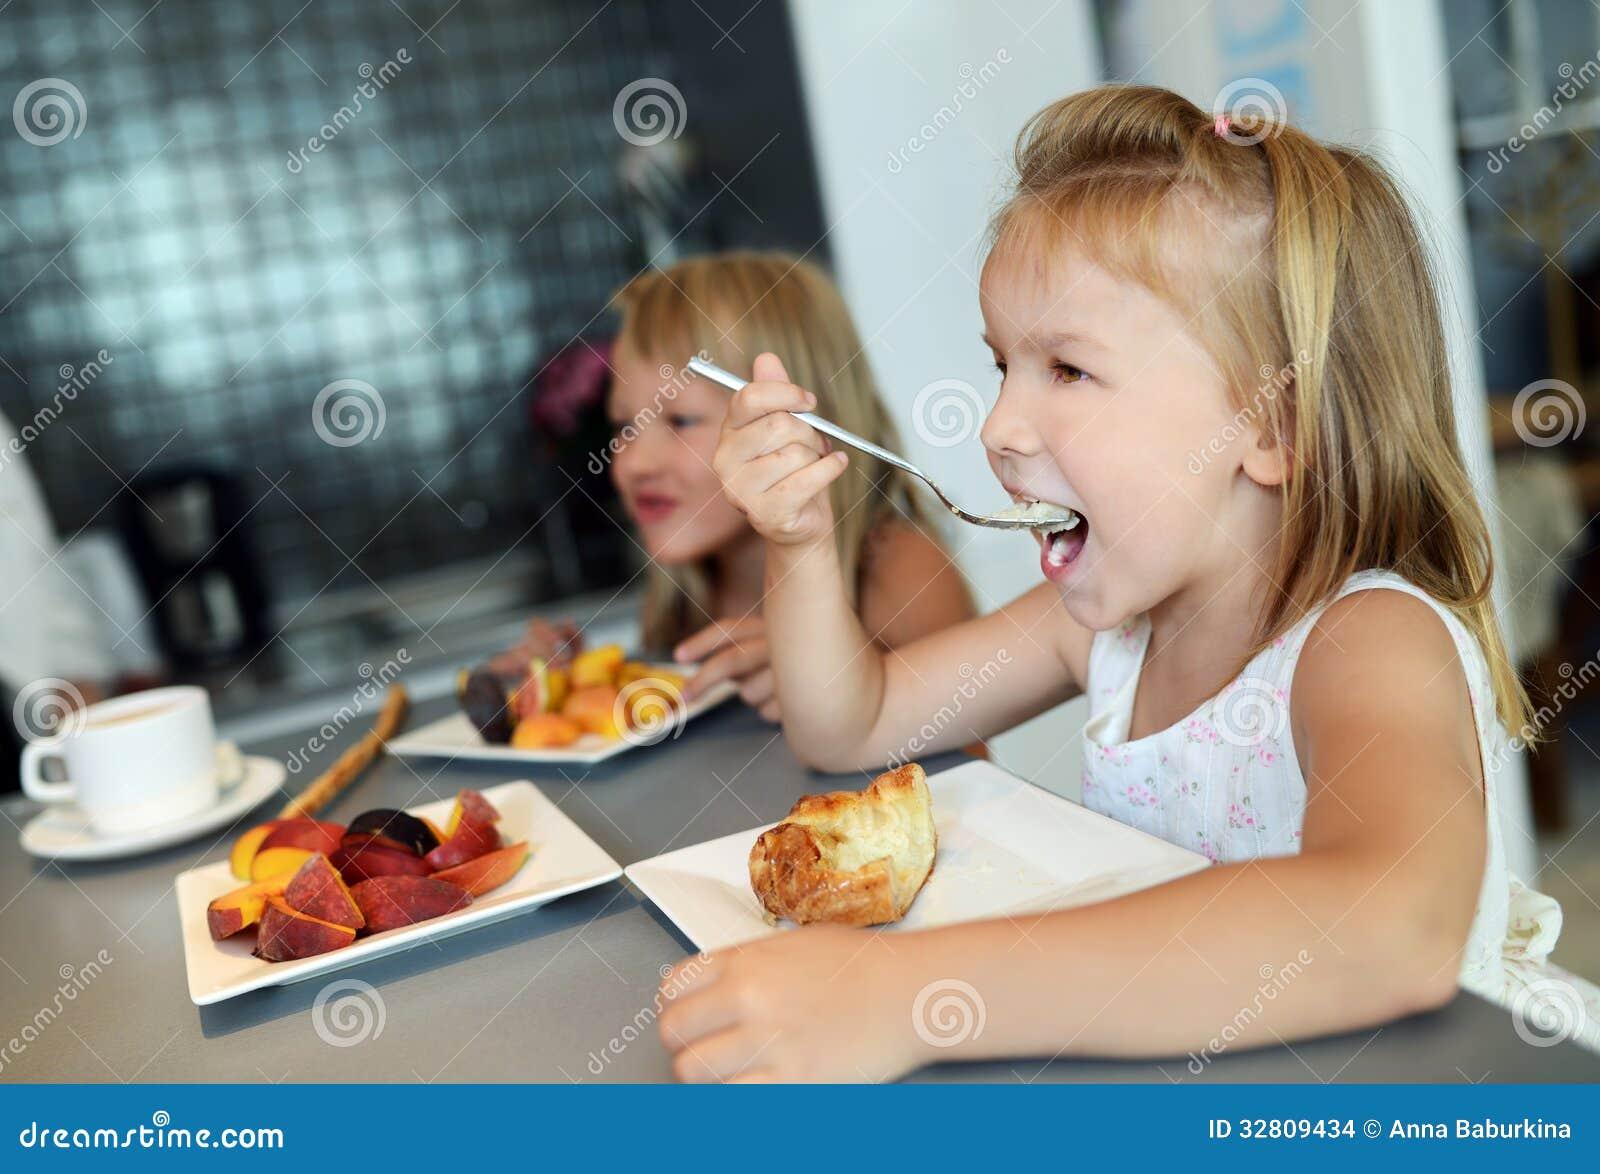 eating babe